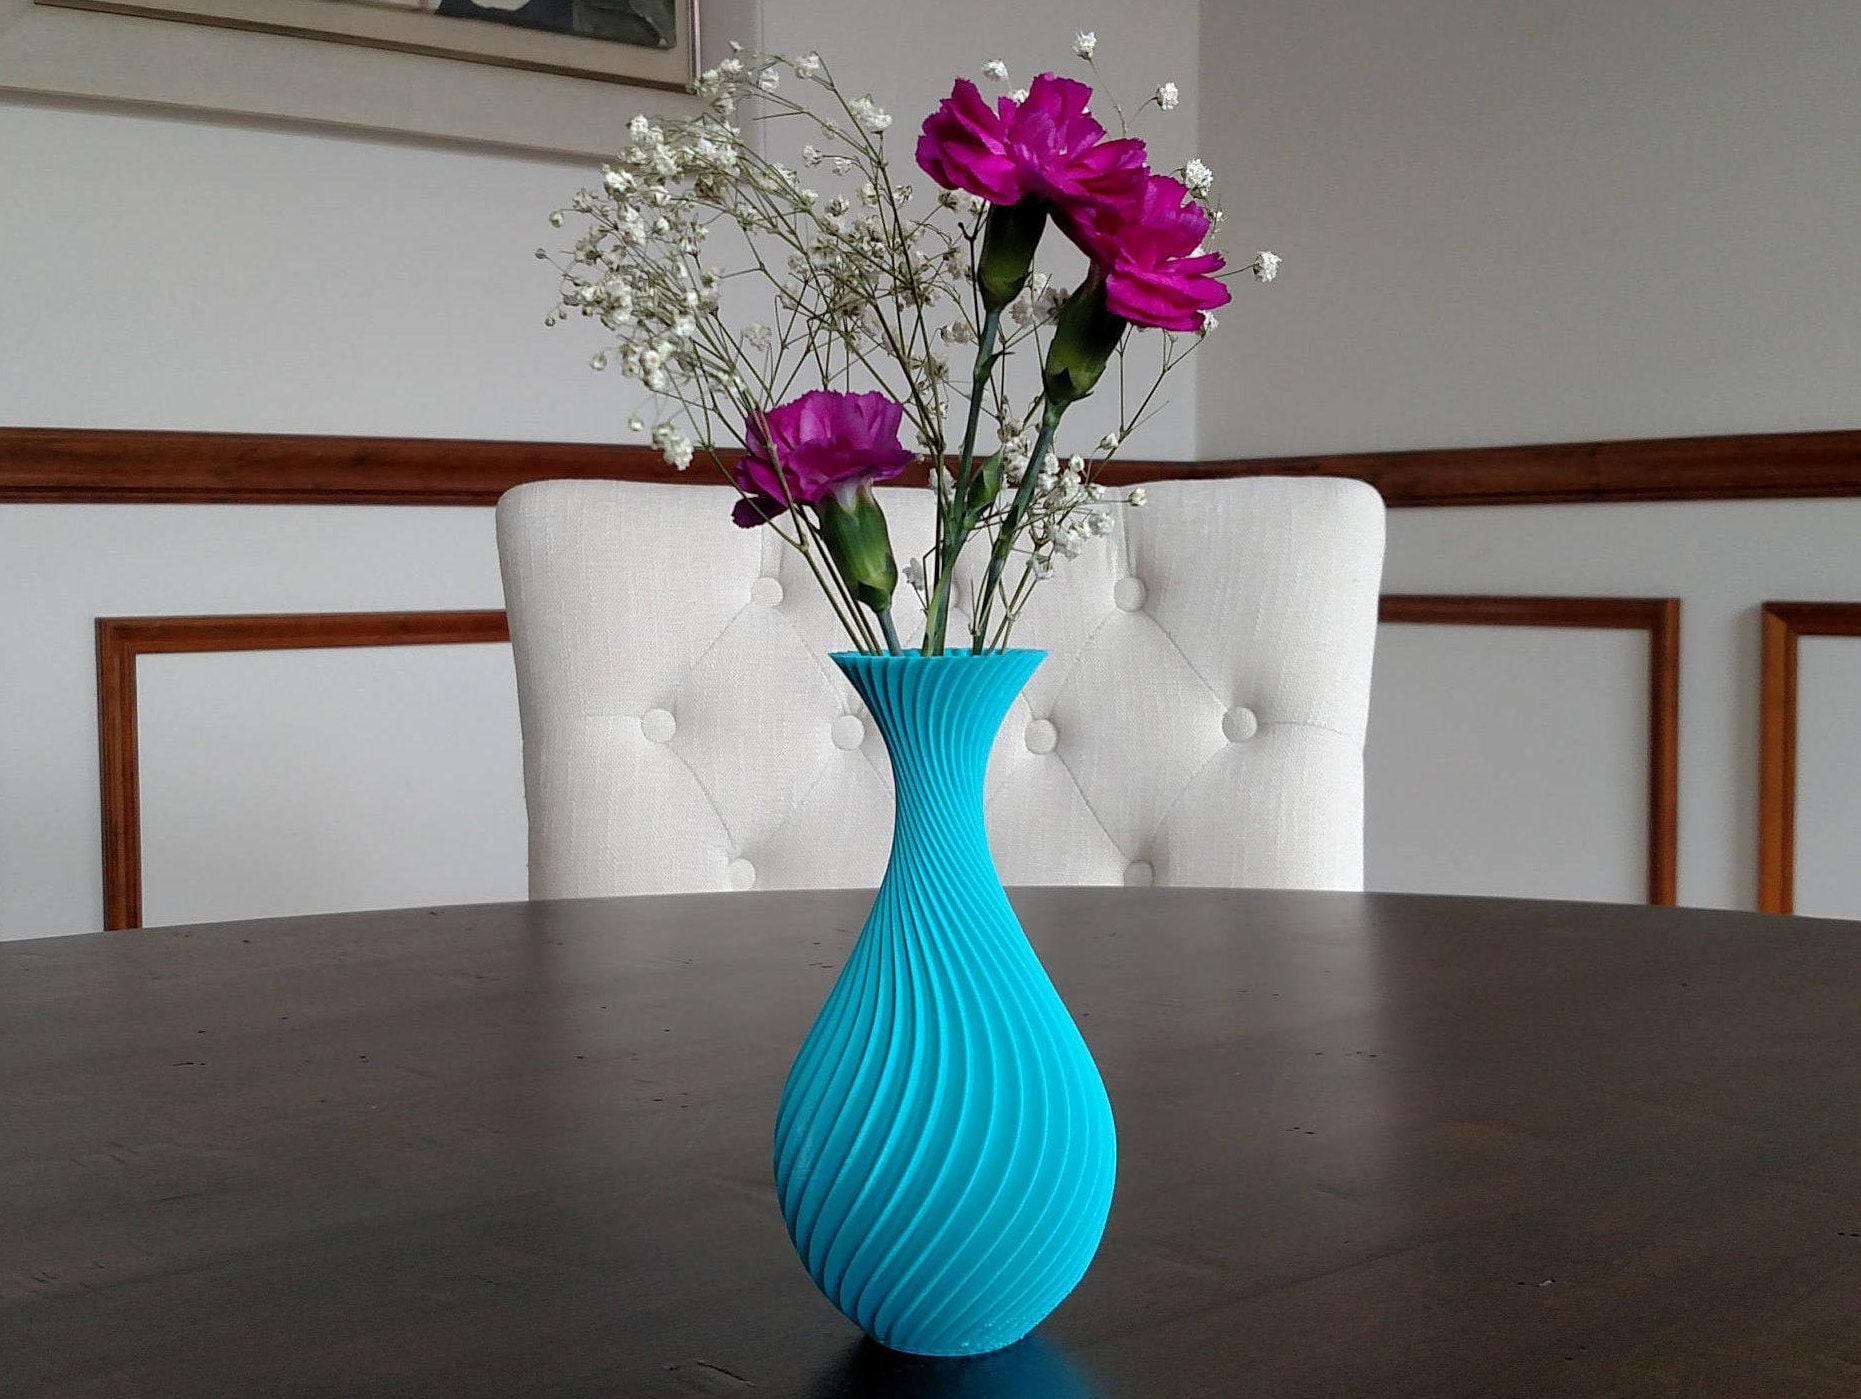 WAVES Art Vase 3d printed home decor Multiple Sizes &   Etsy